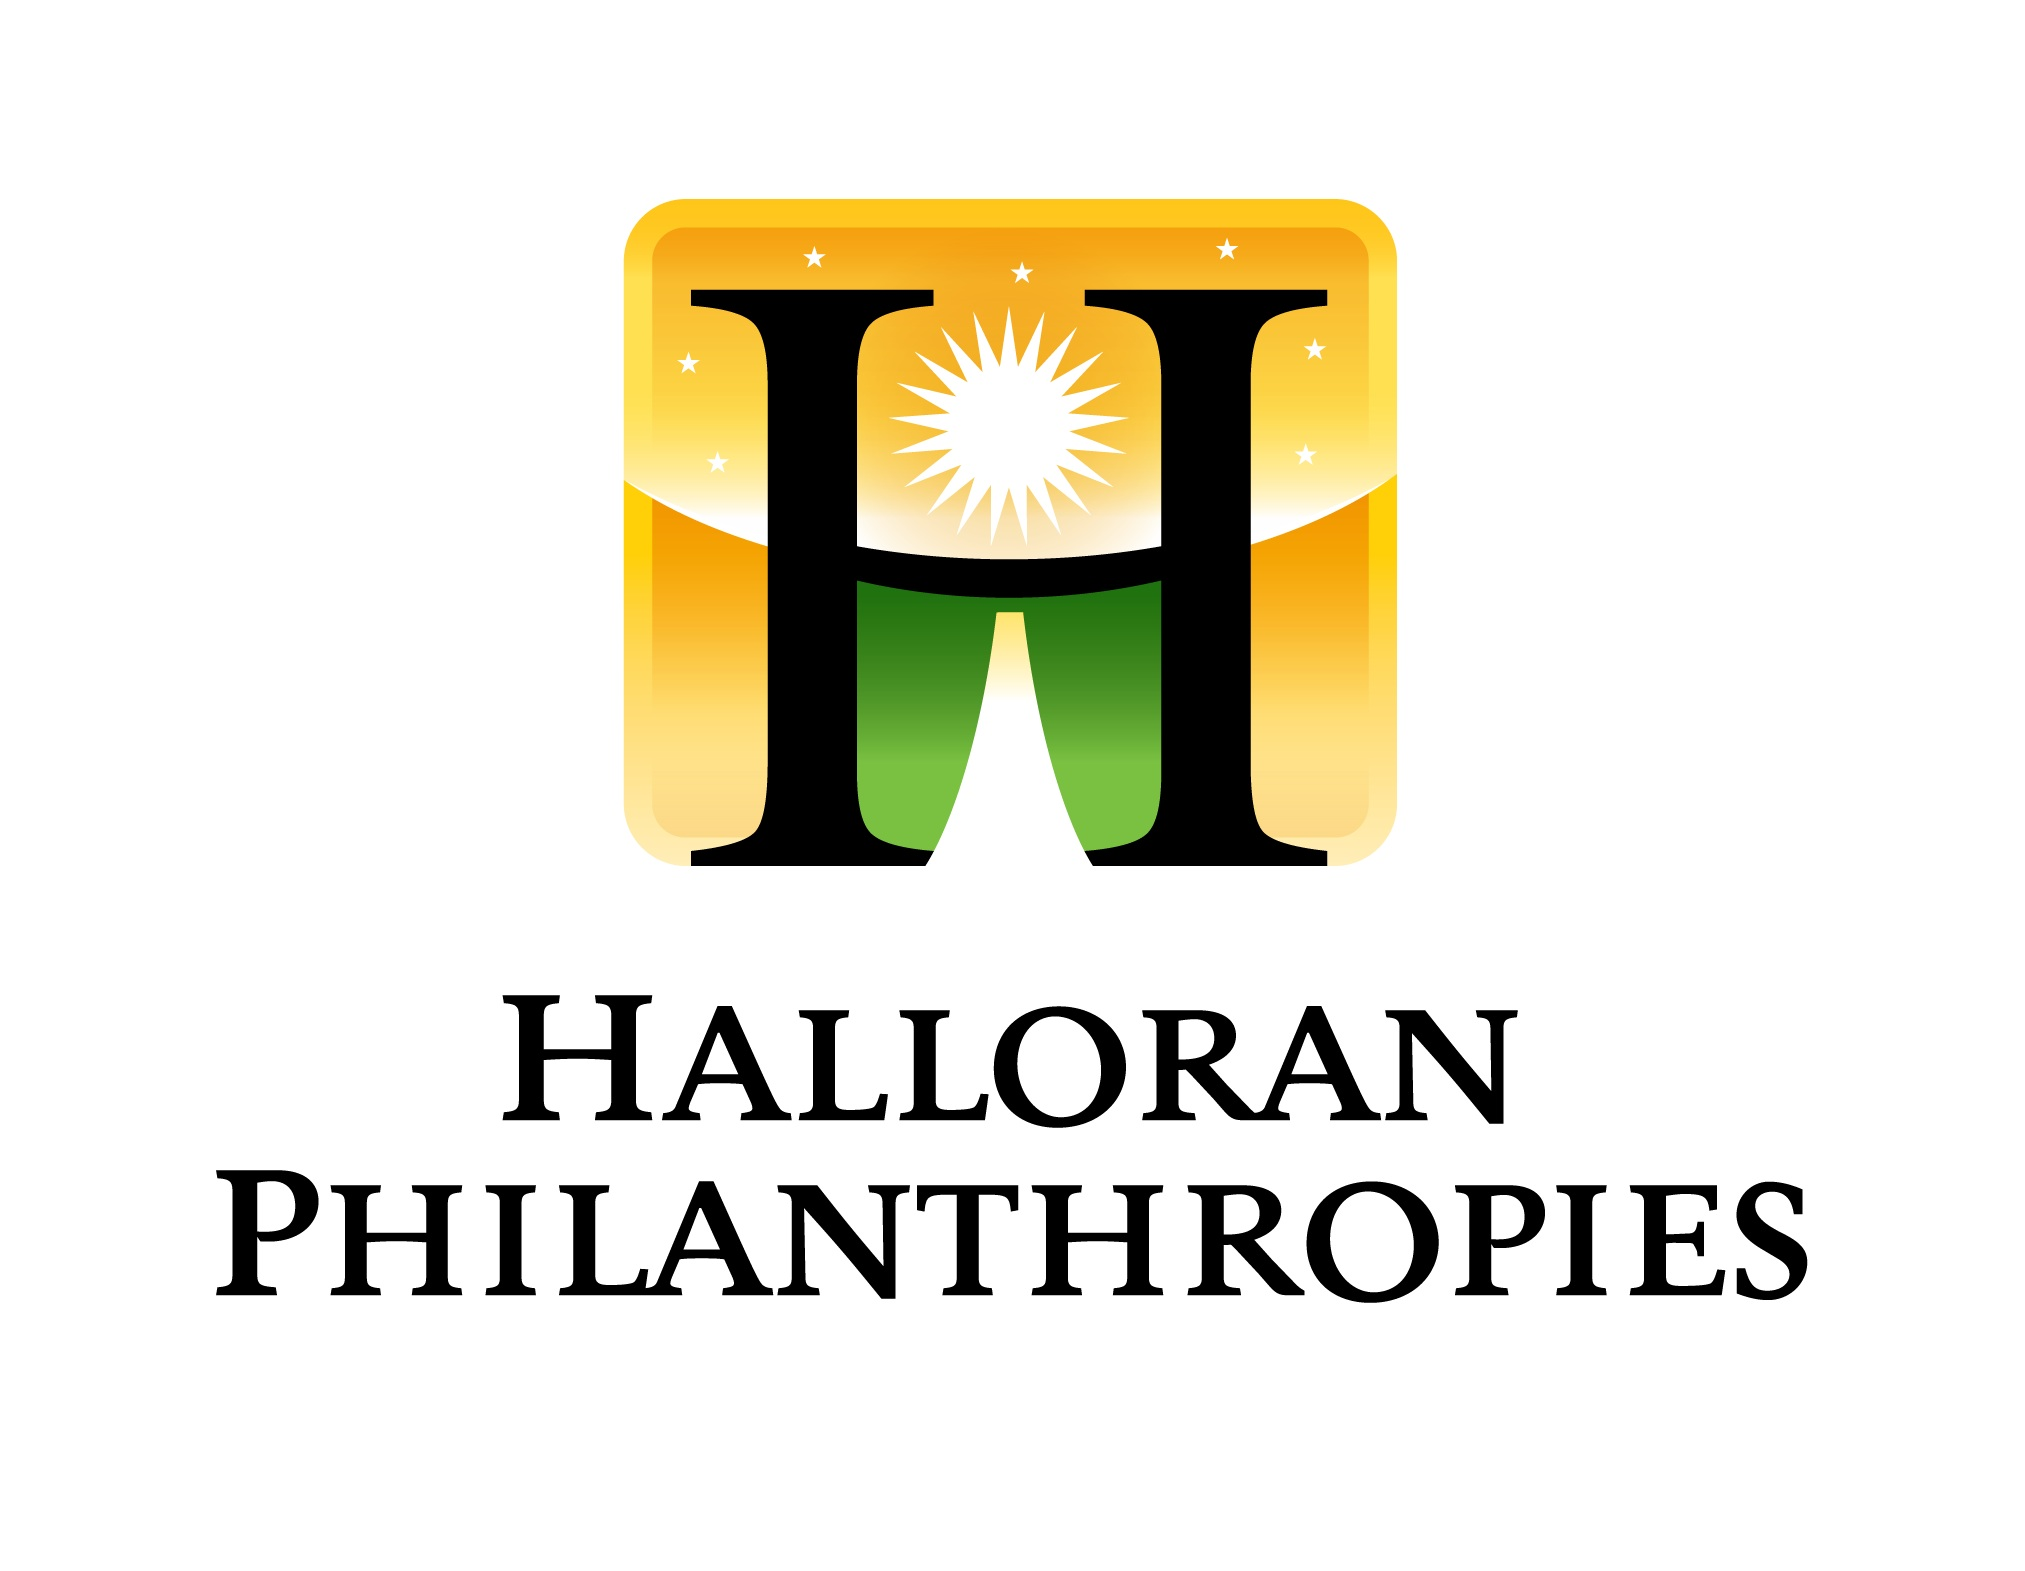 Halloran Philanthropies